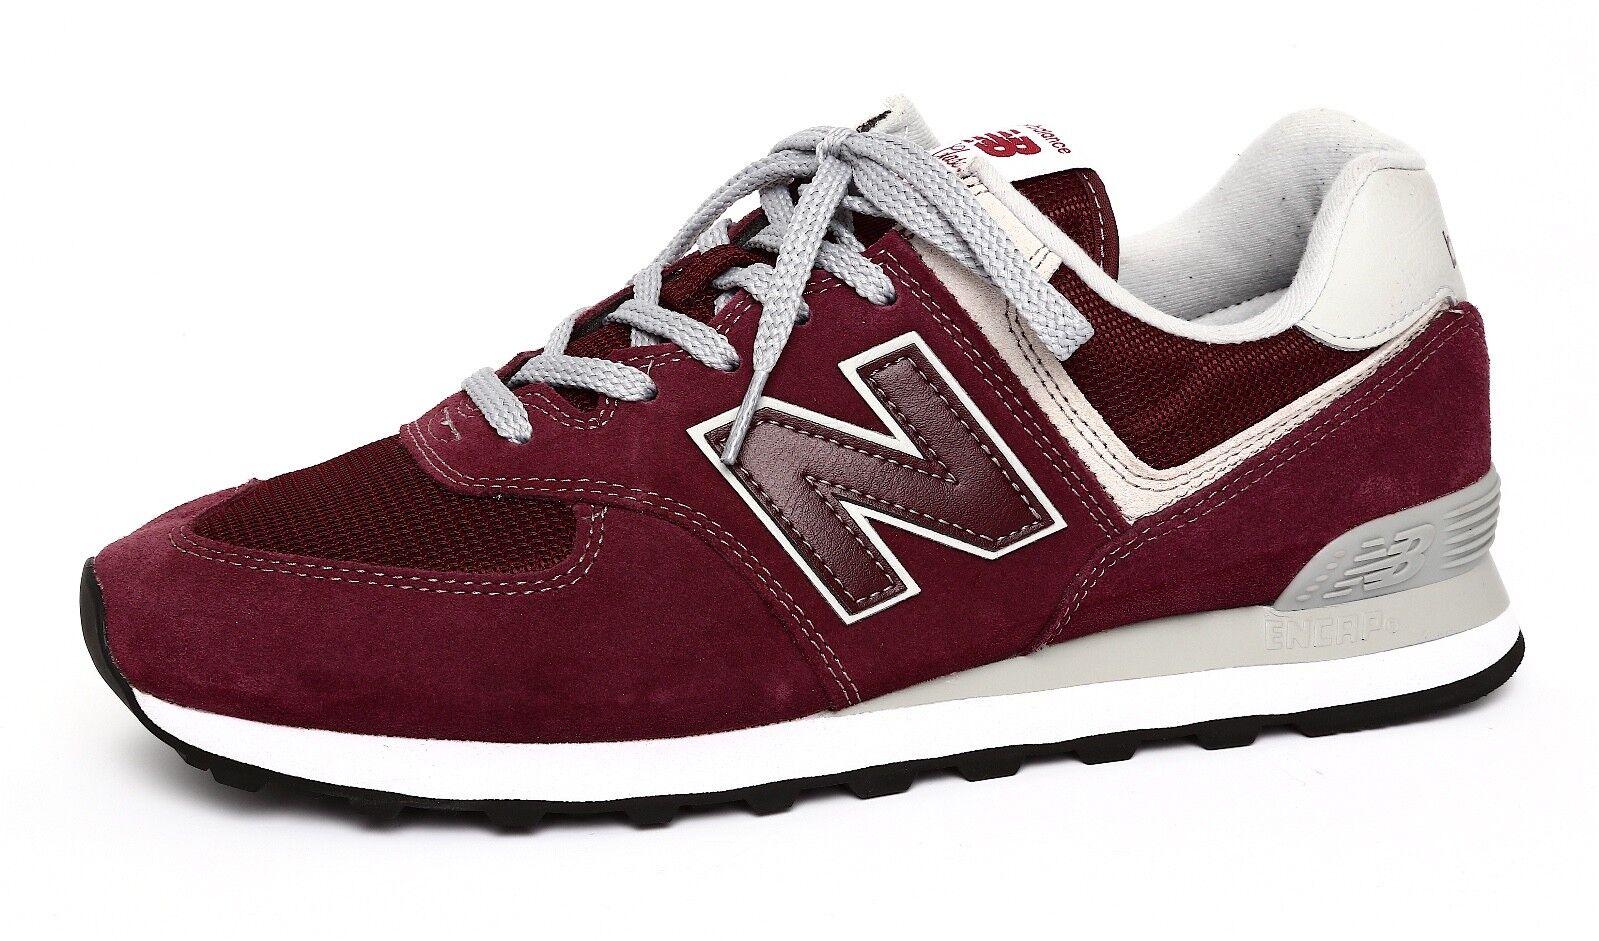 New Balance Men's 574 Classic Burgundy Sneaker Sz 11D 2631